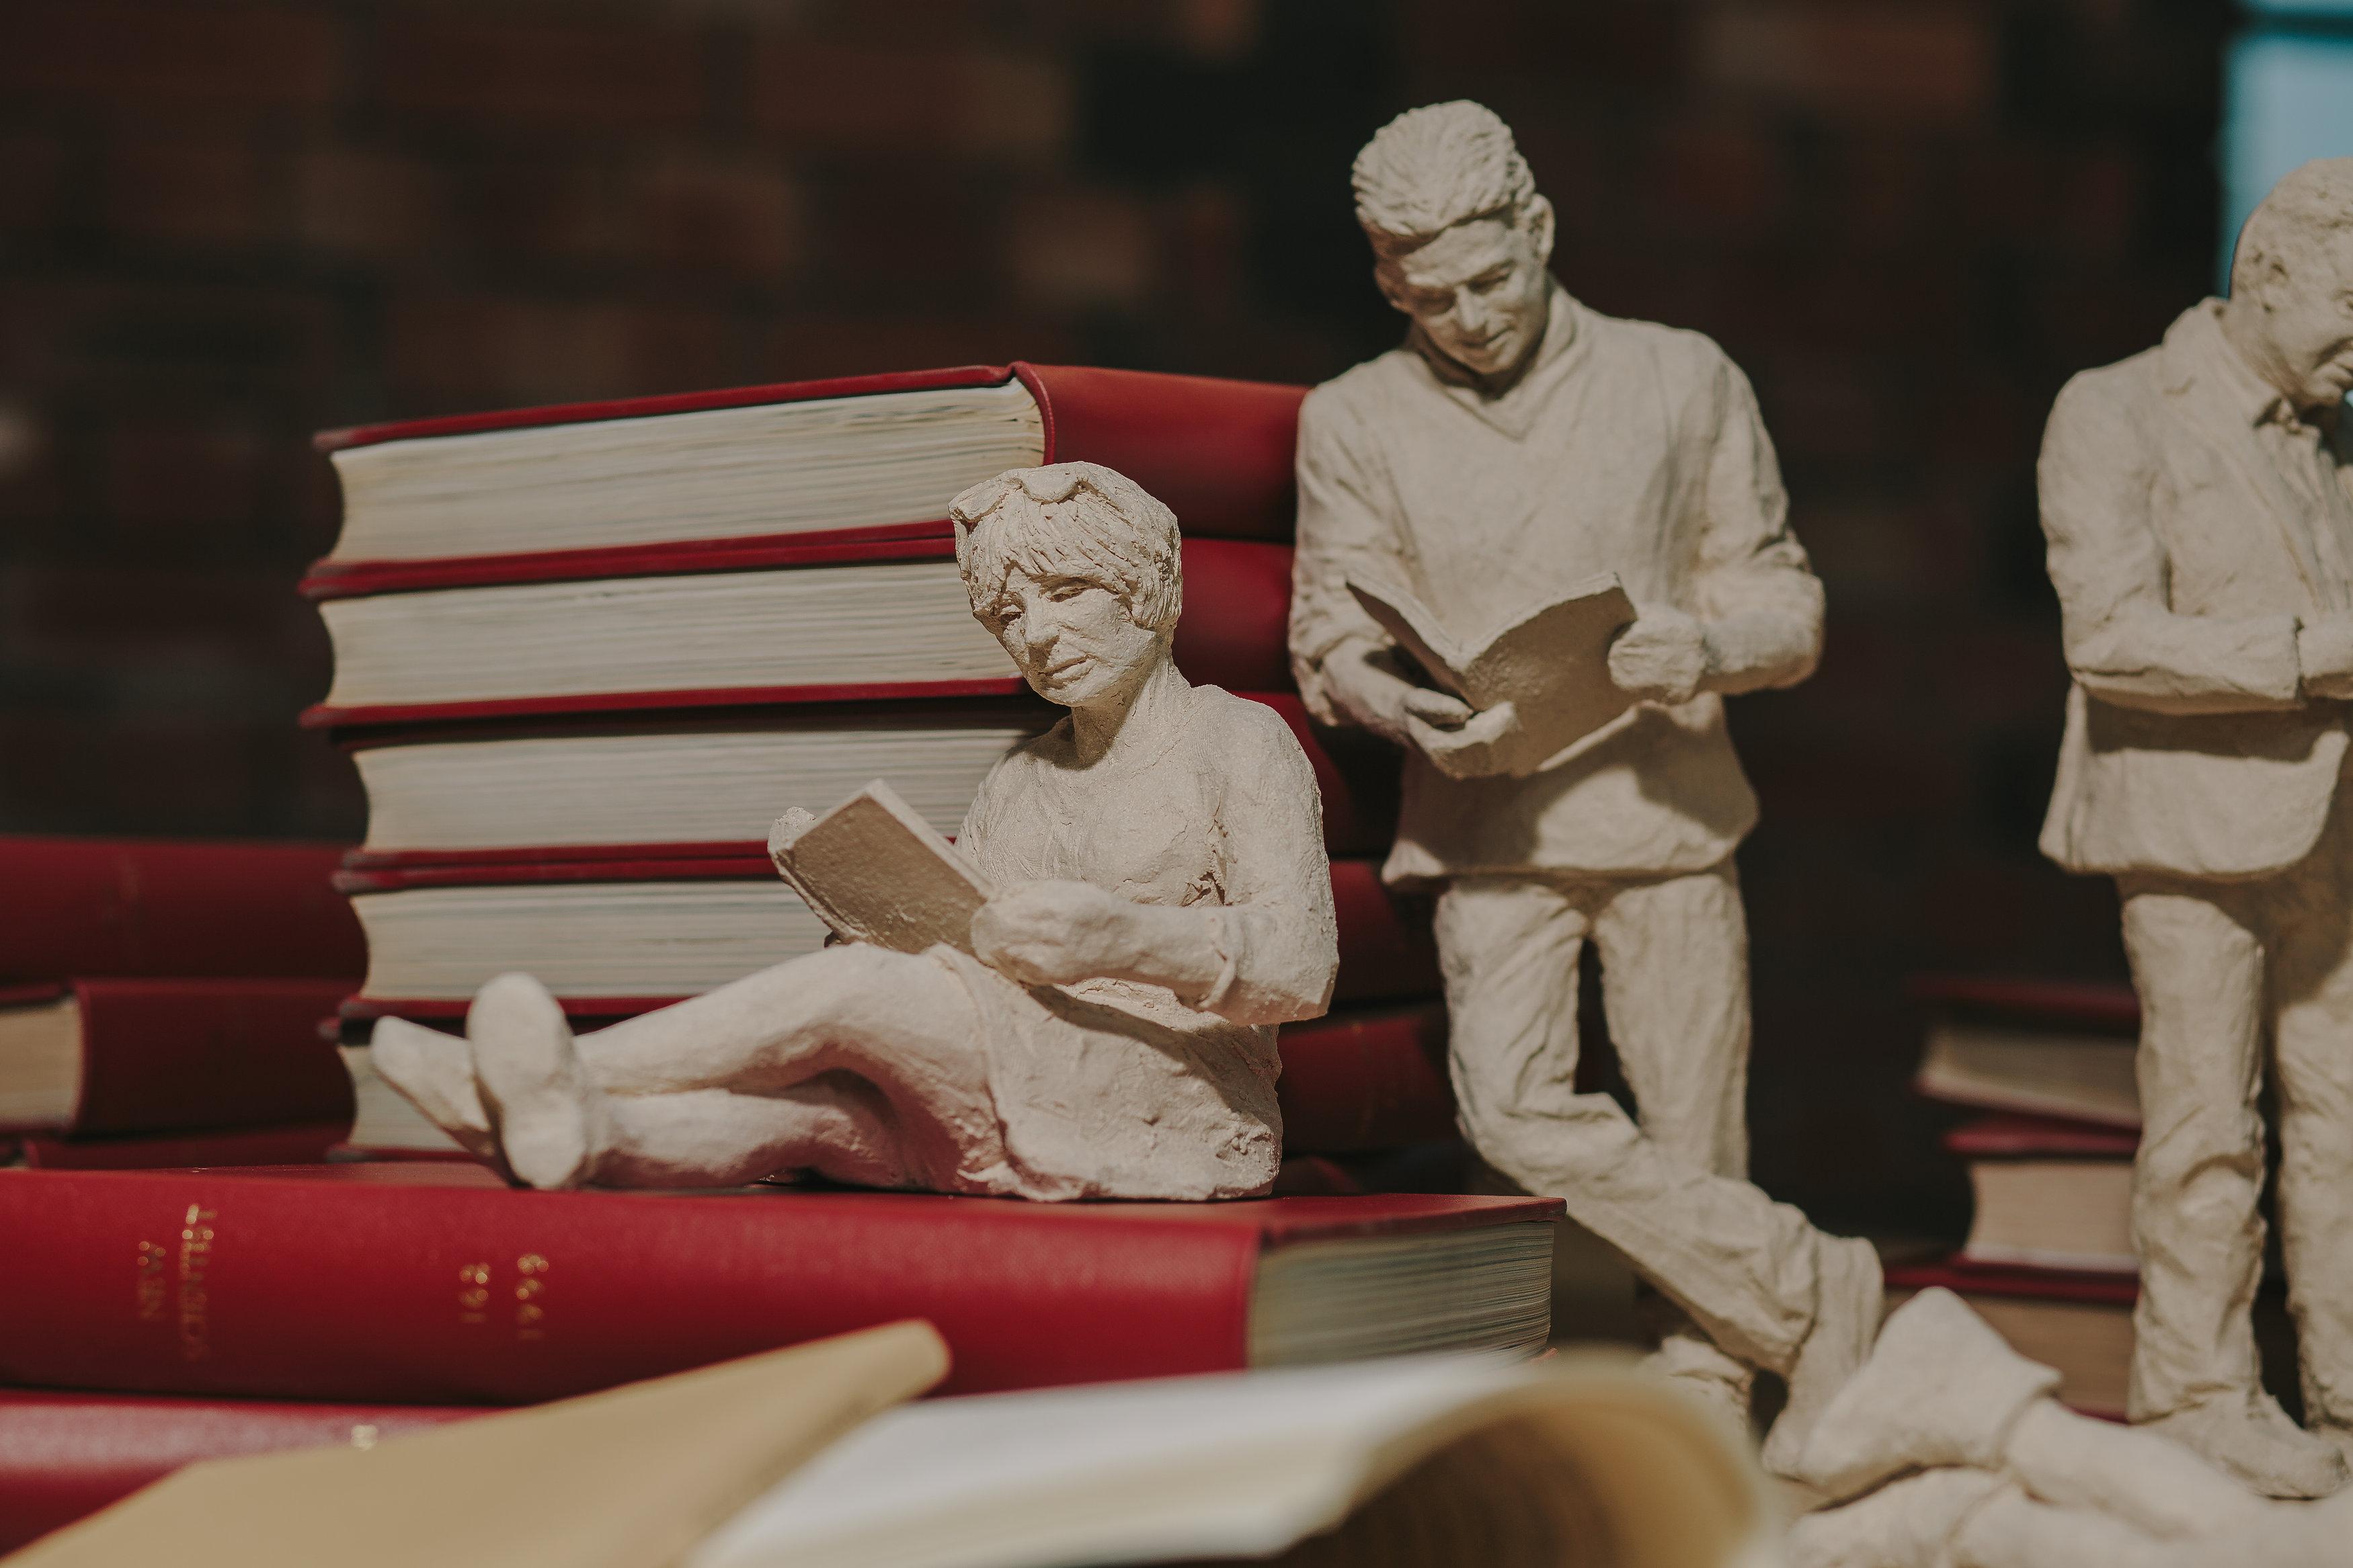 Nomatei - Readers